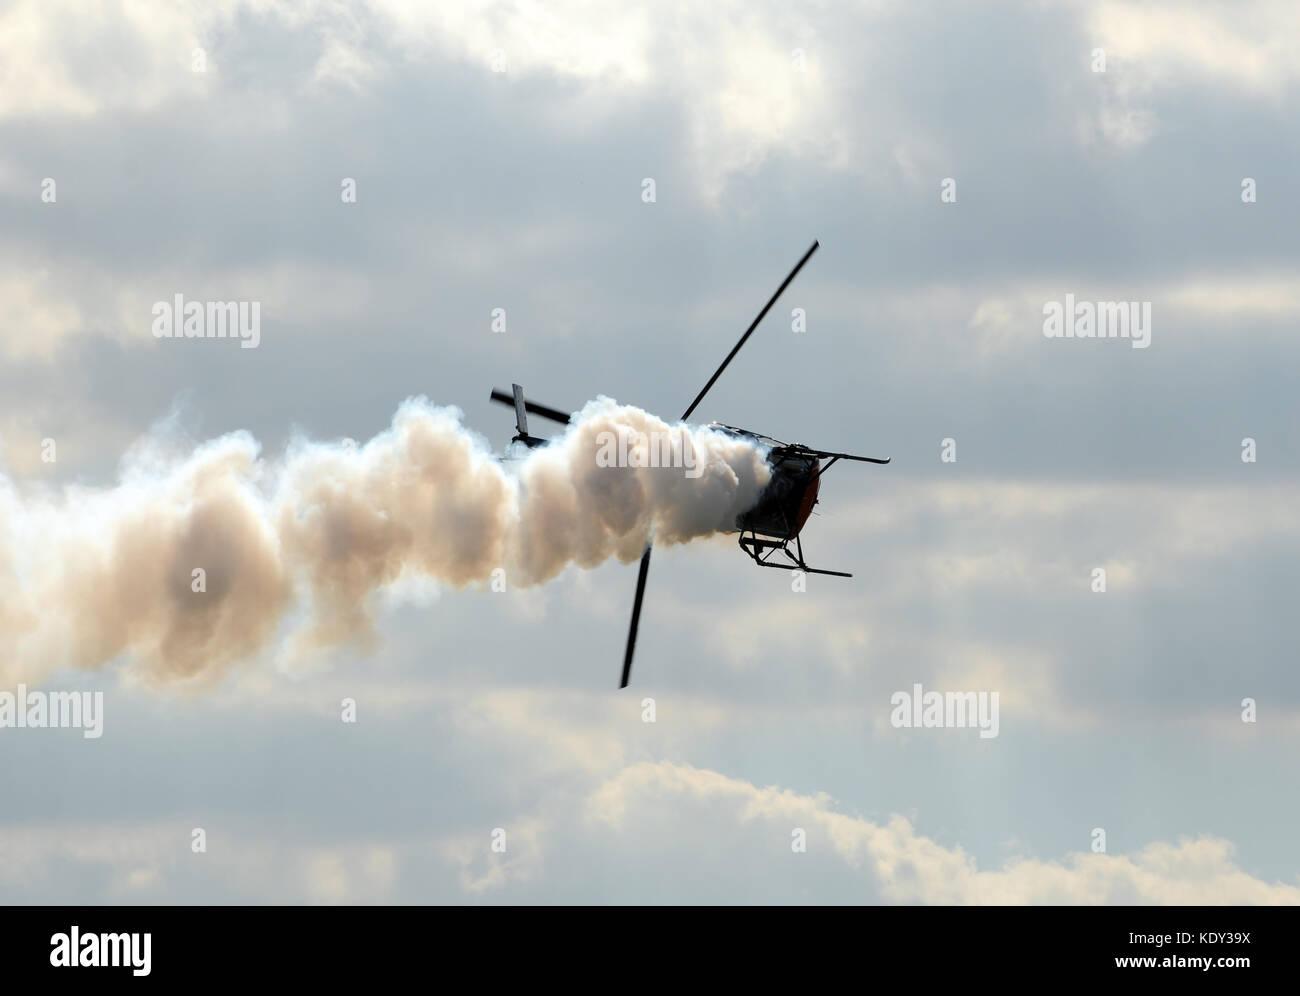 Light helicopter with smoke making emergency landing - Stock Image